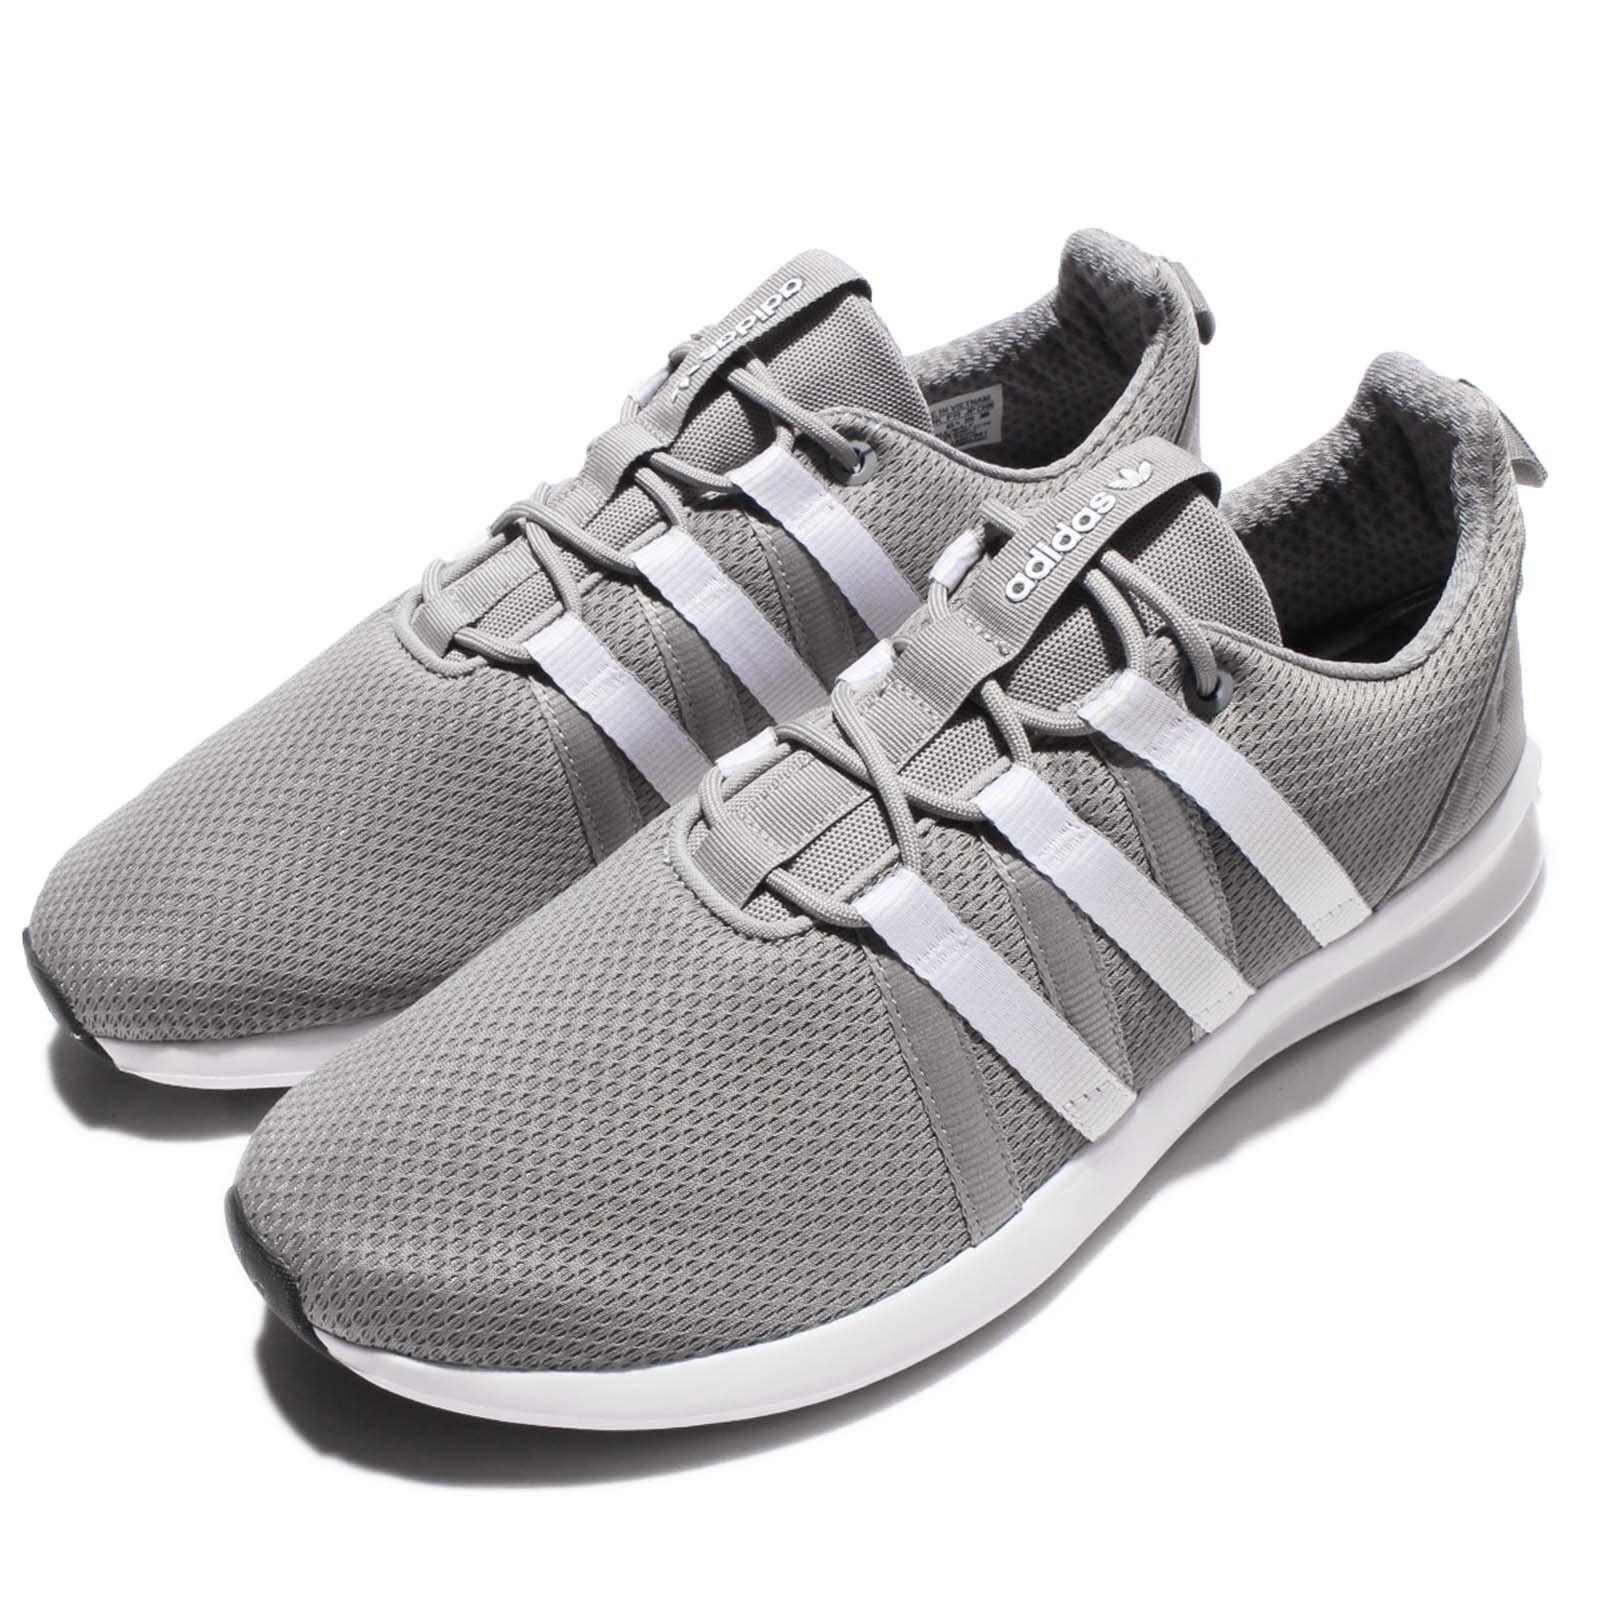 Adidas Originals Hombre Loop Racer Gris Blanco Hombre Originals running Shoes Sneakers b42442 gran descuento 0852cb